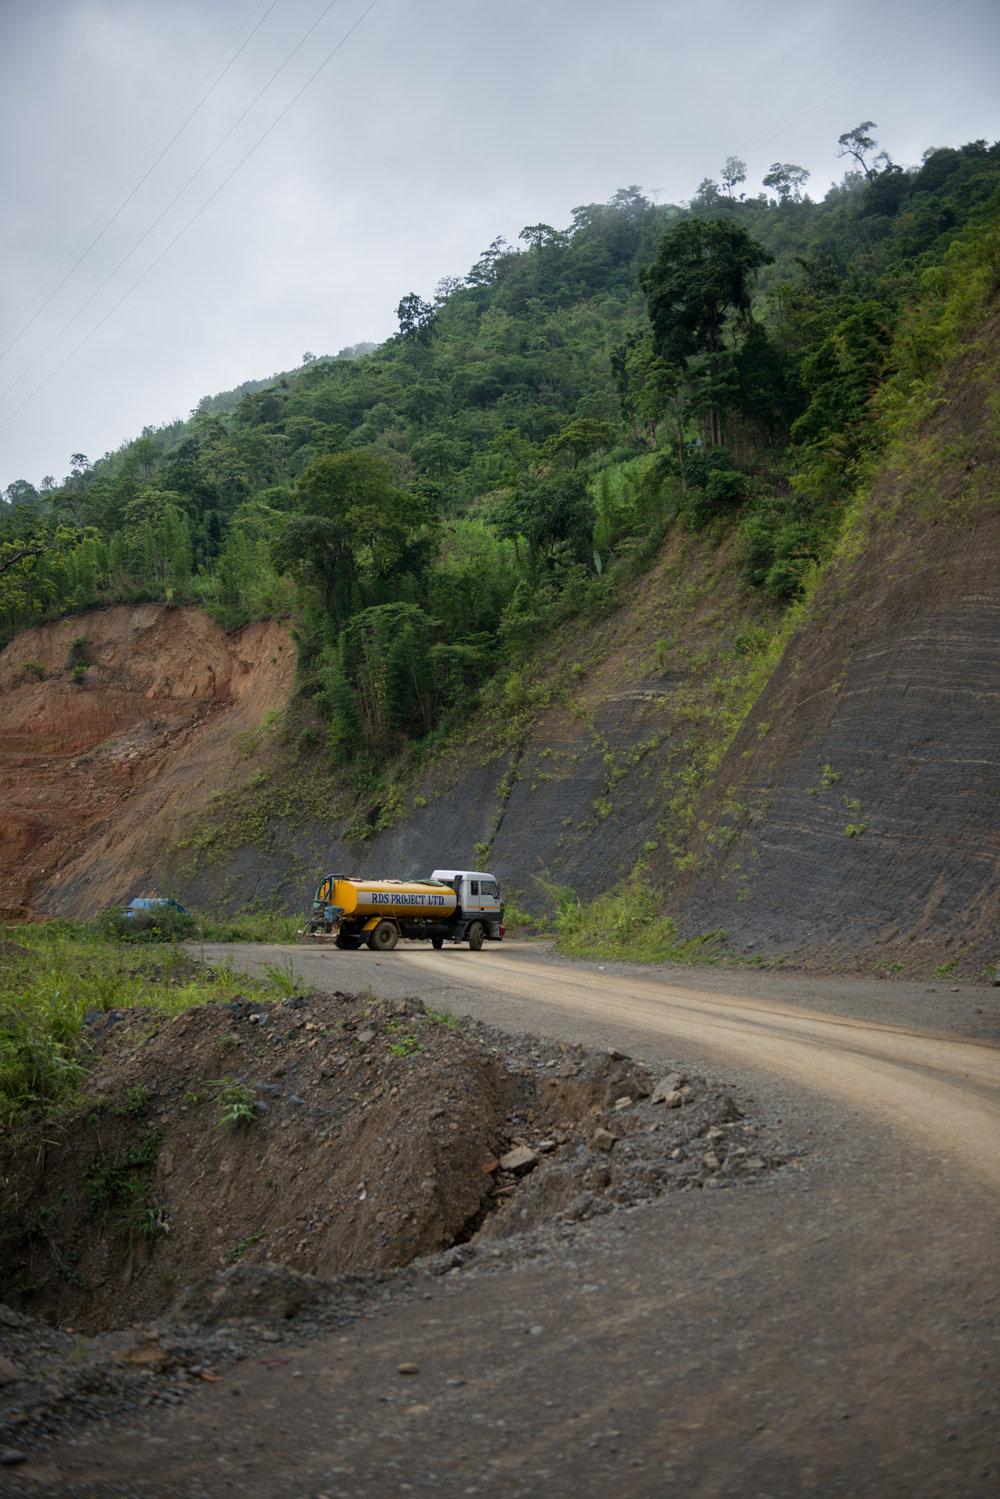 7_Chhandak Pradhan-Reportage-The_Promise_of_Asphalt-Border_road_NE India_Burma_Le Monde.jpg